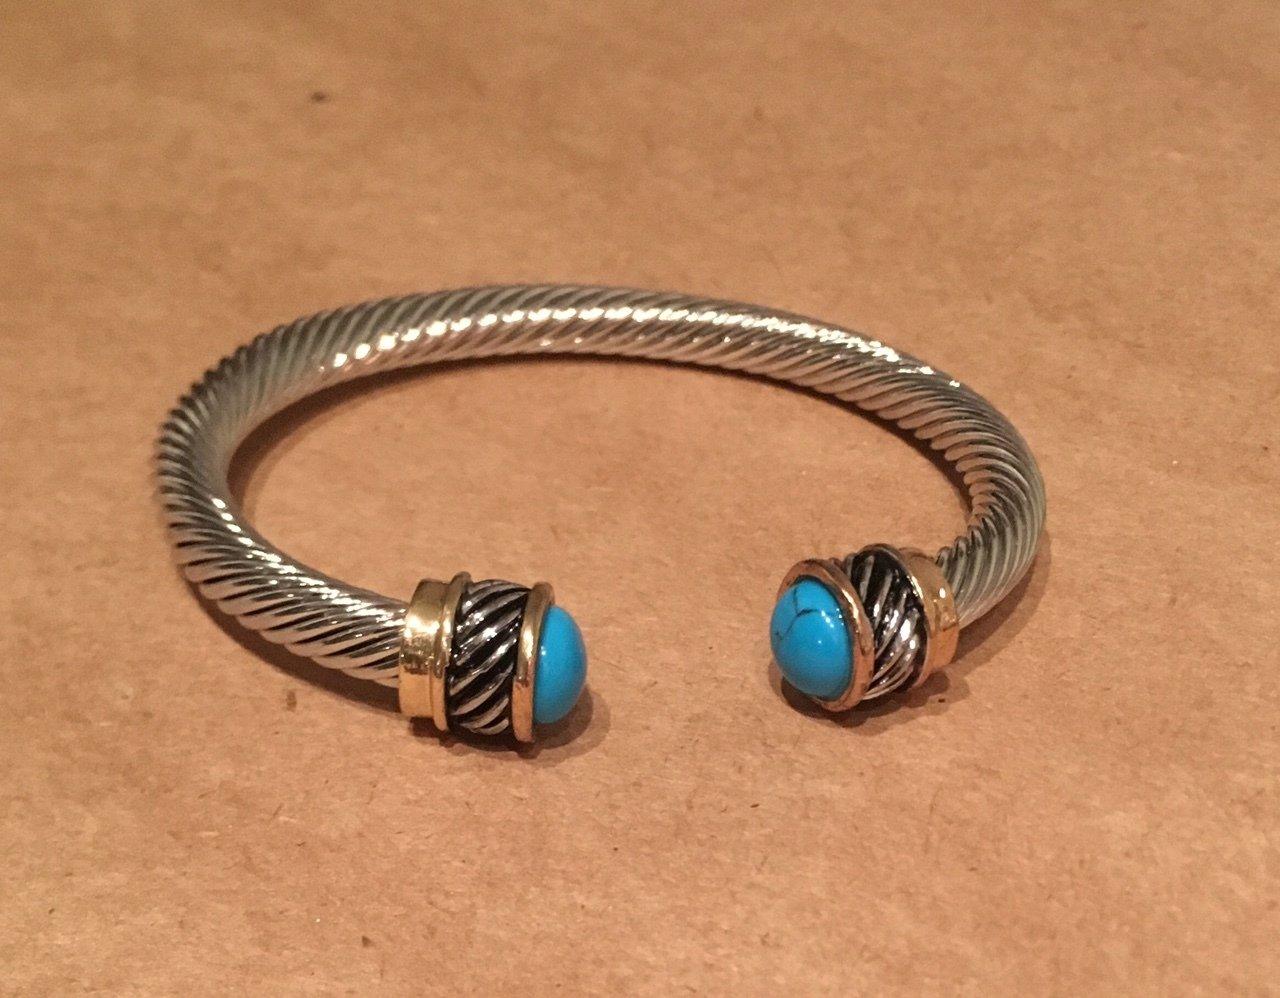 Yurman Style Turquoise Tipped Bangle OJ-0808